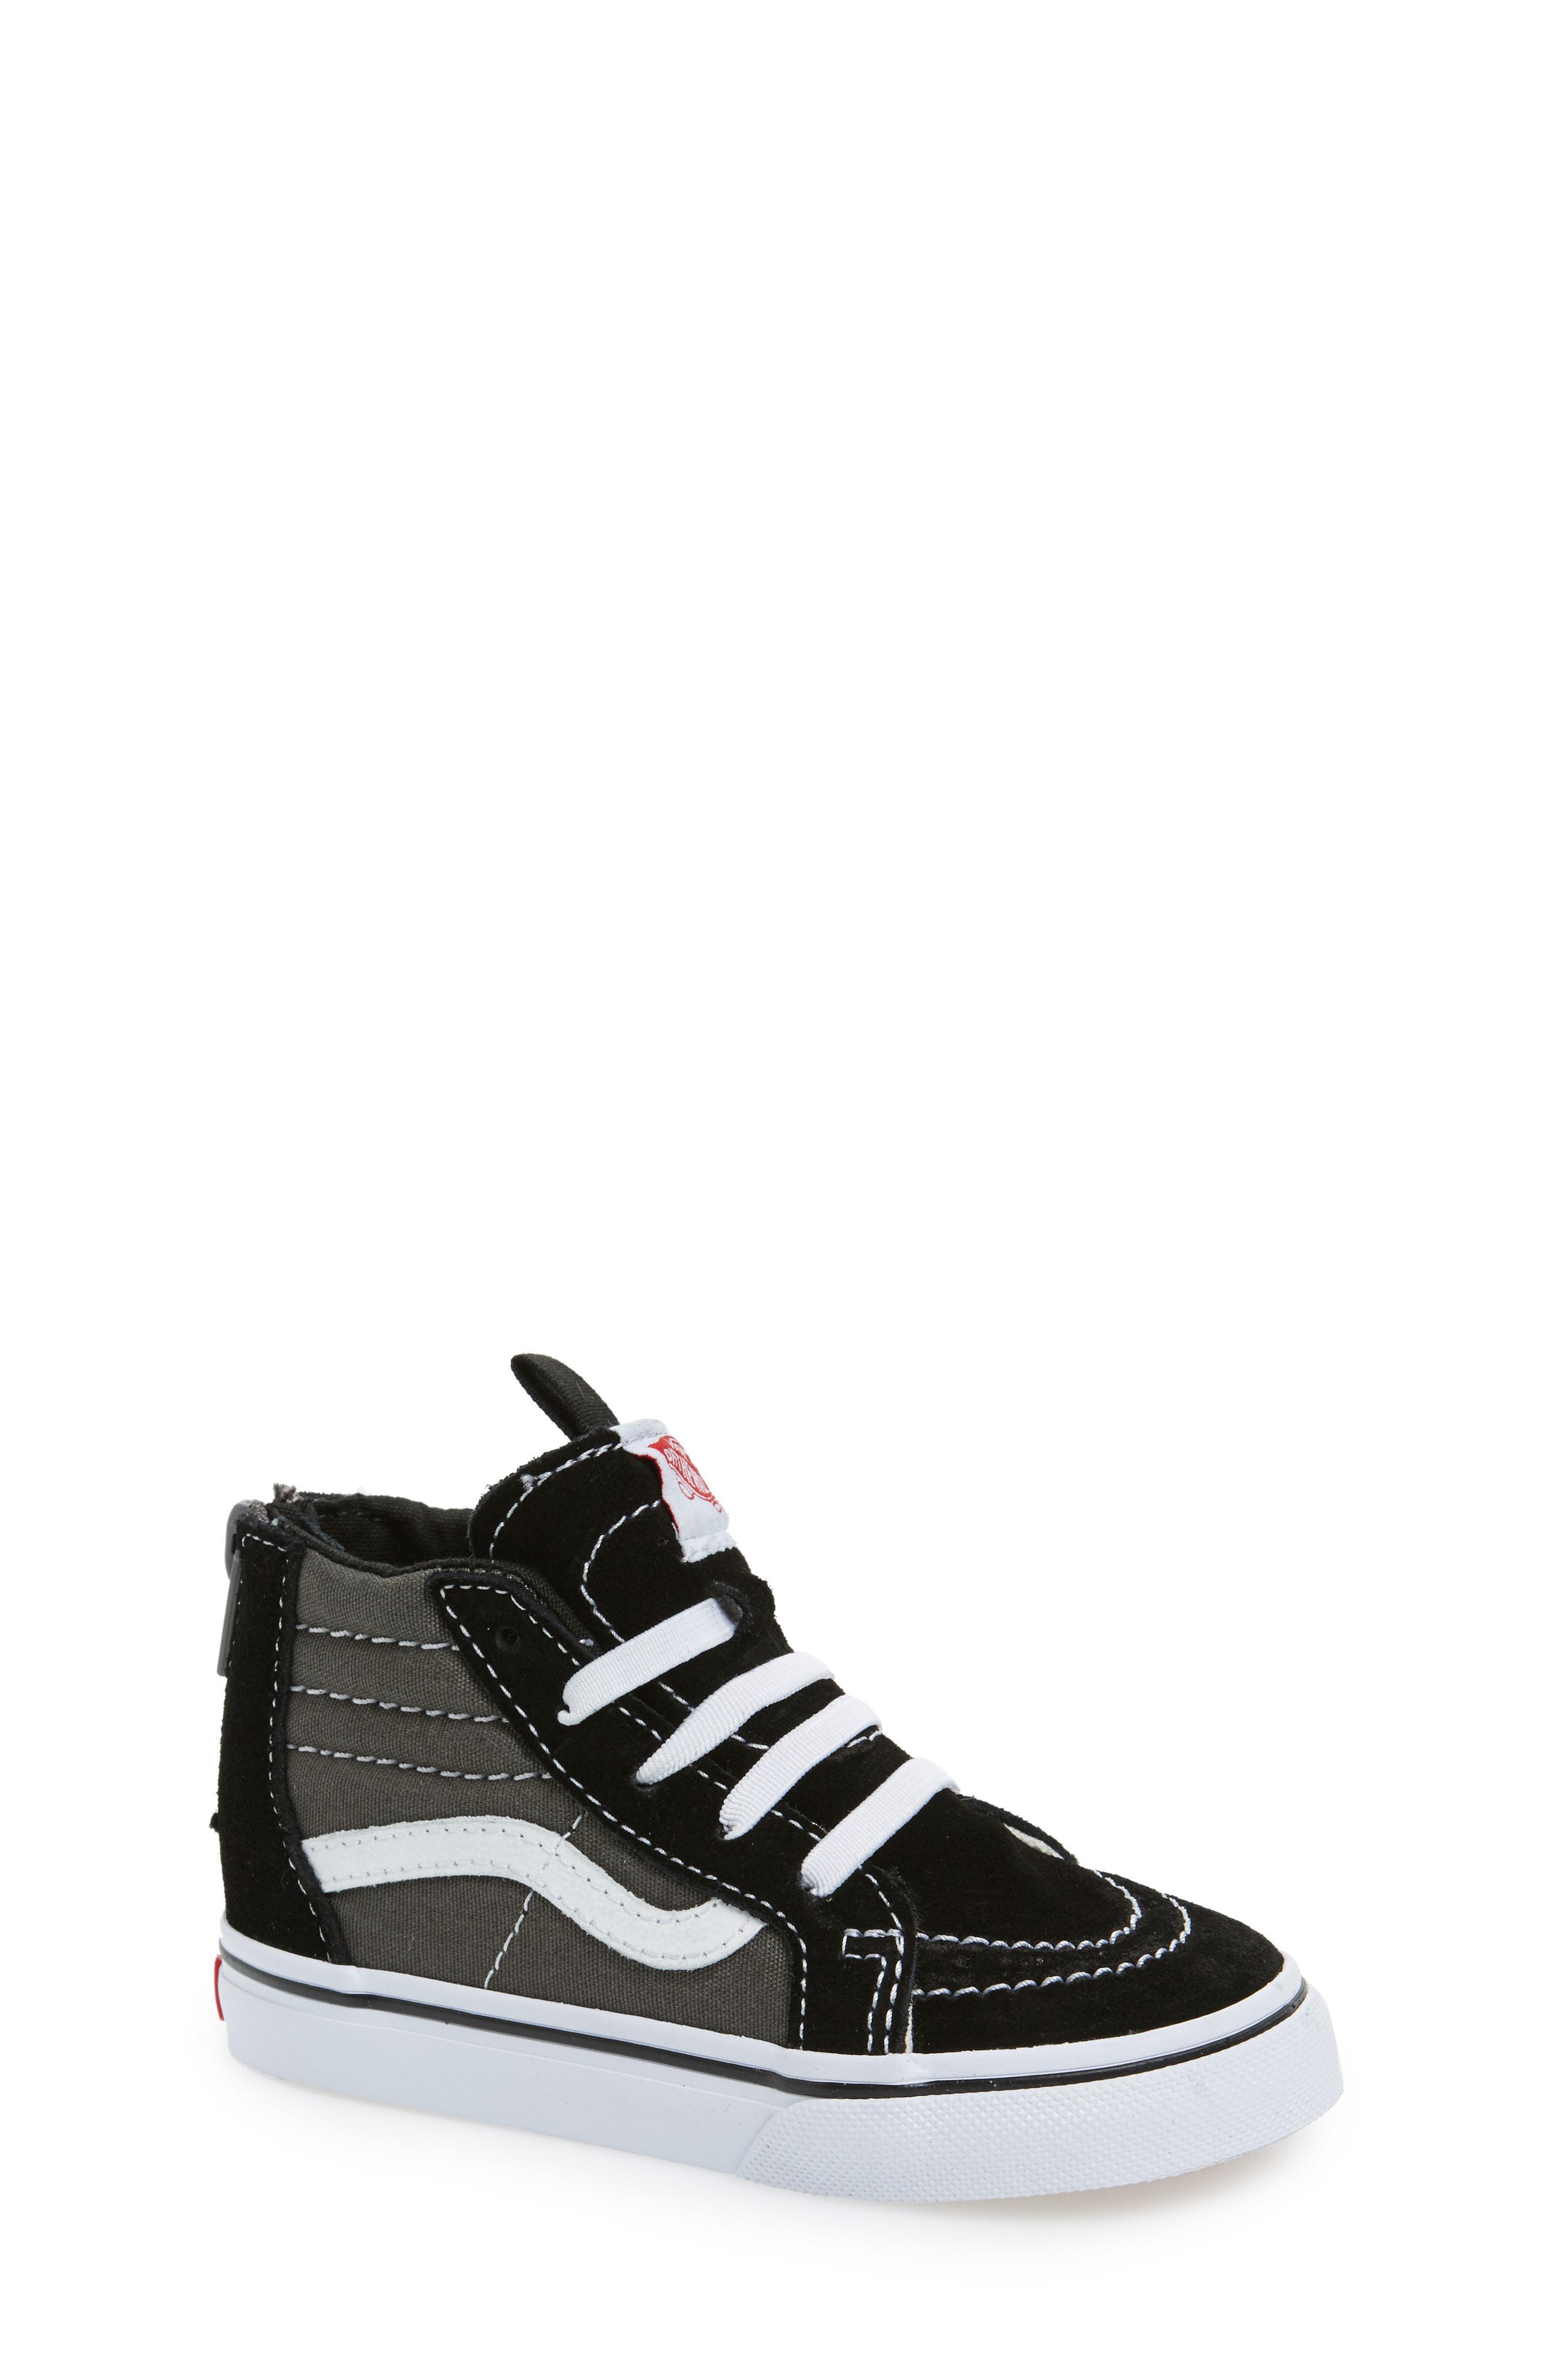 d9c11a77643e Lyst - Vans  sk8-hi  Sneaker in Black for Men